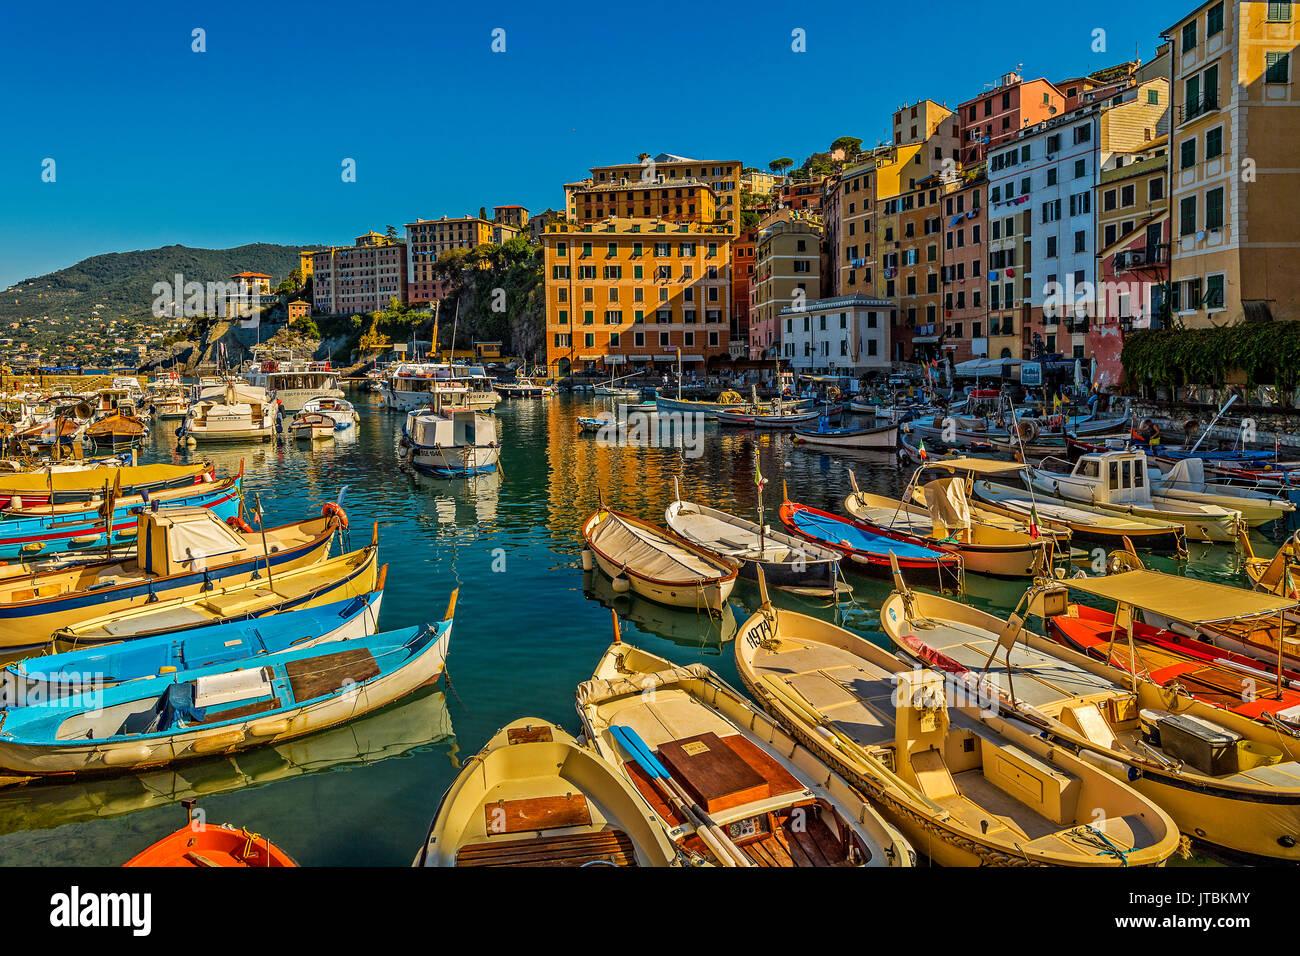 Italy Liguria Camogli view of the fisher port - Stock Image